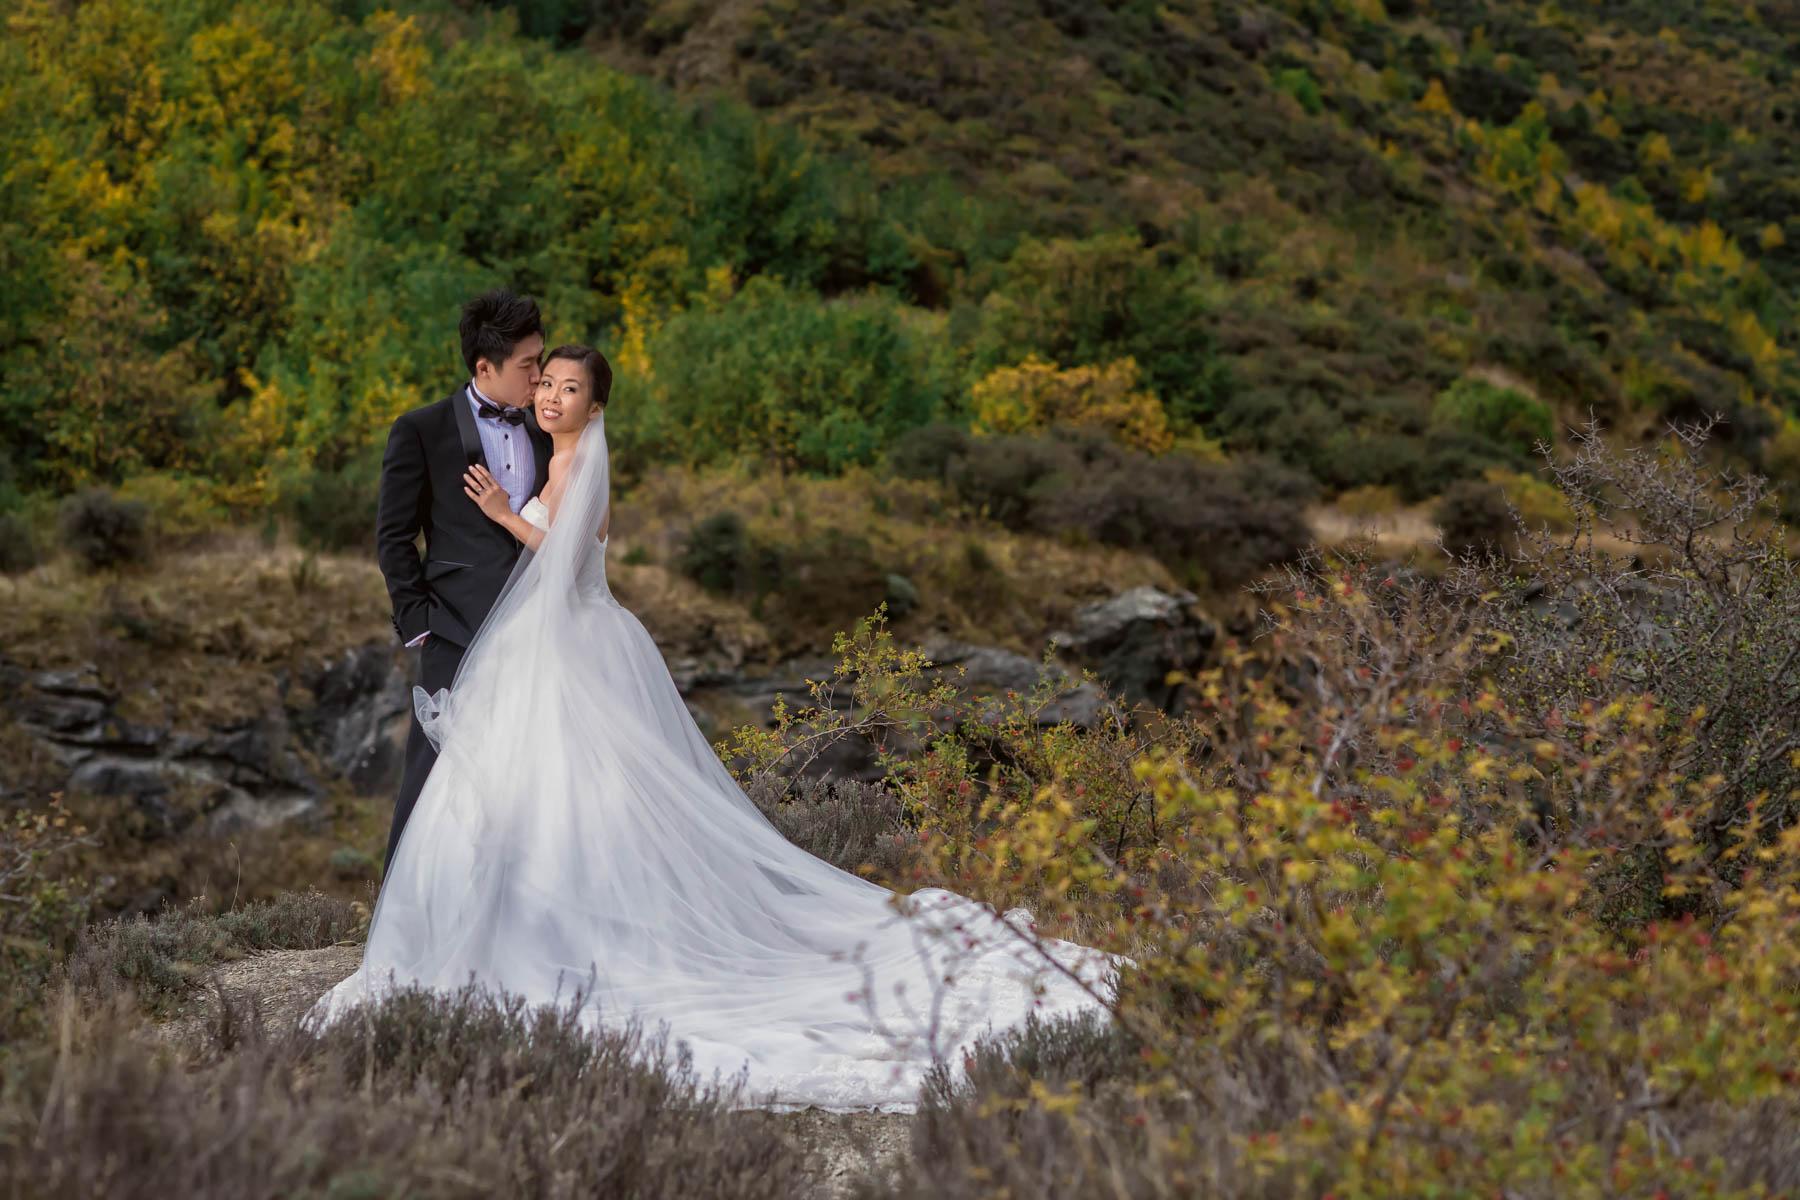 preweddingpictures_nzphotographer.jpg